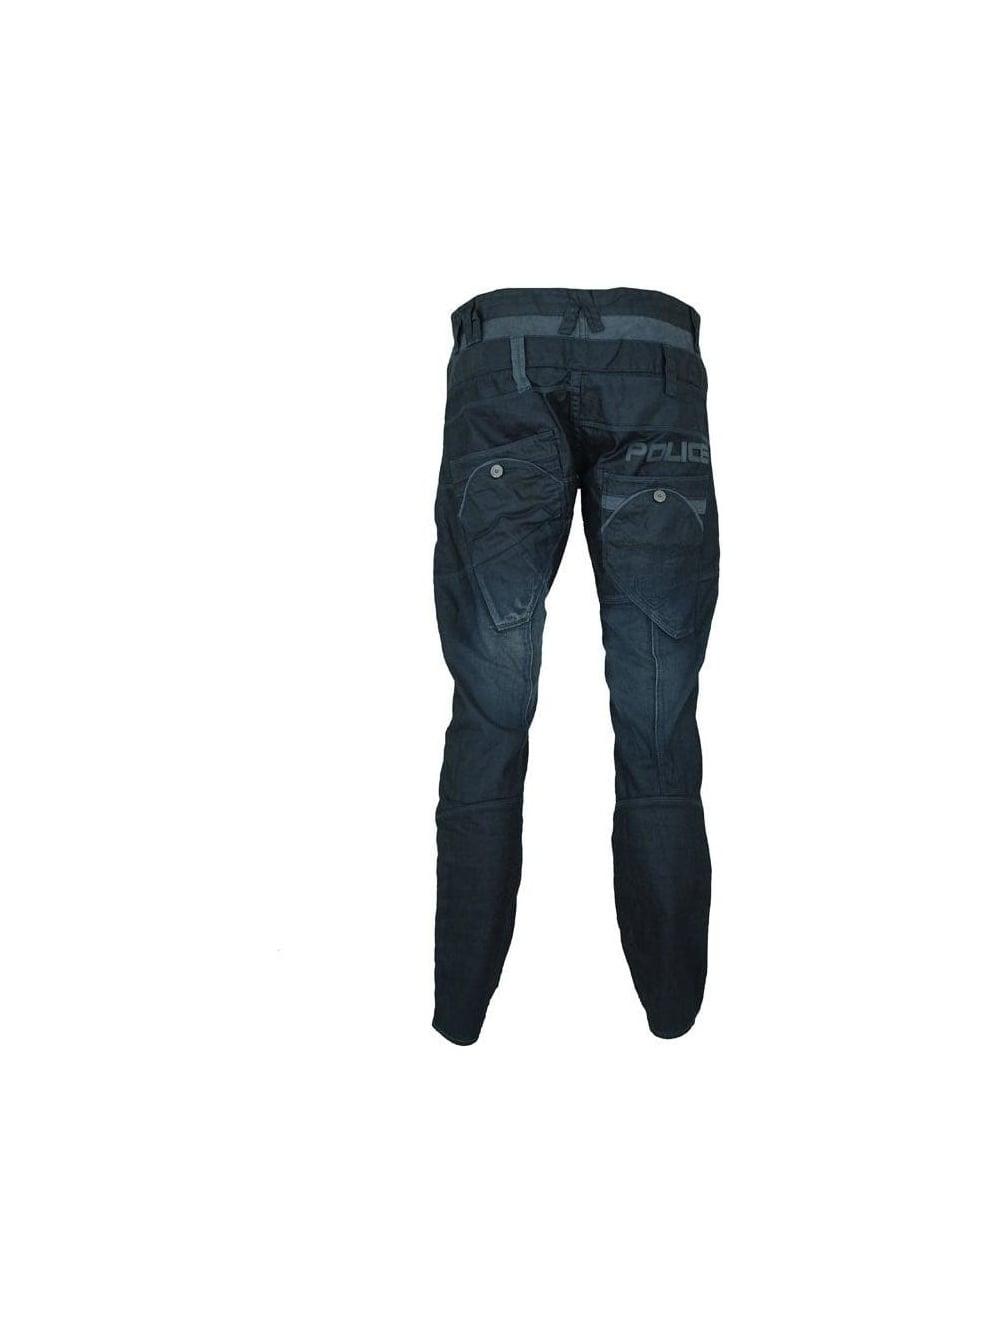 41e1c323 883 Police Lotus Cargo Jeans in Dark Blue - Shop 883 Police at ...